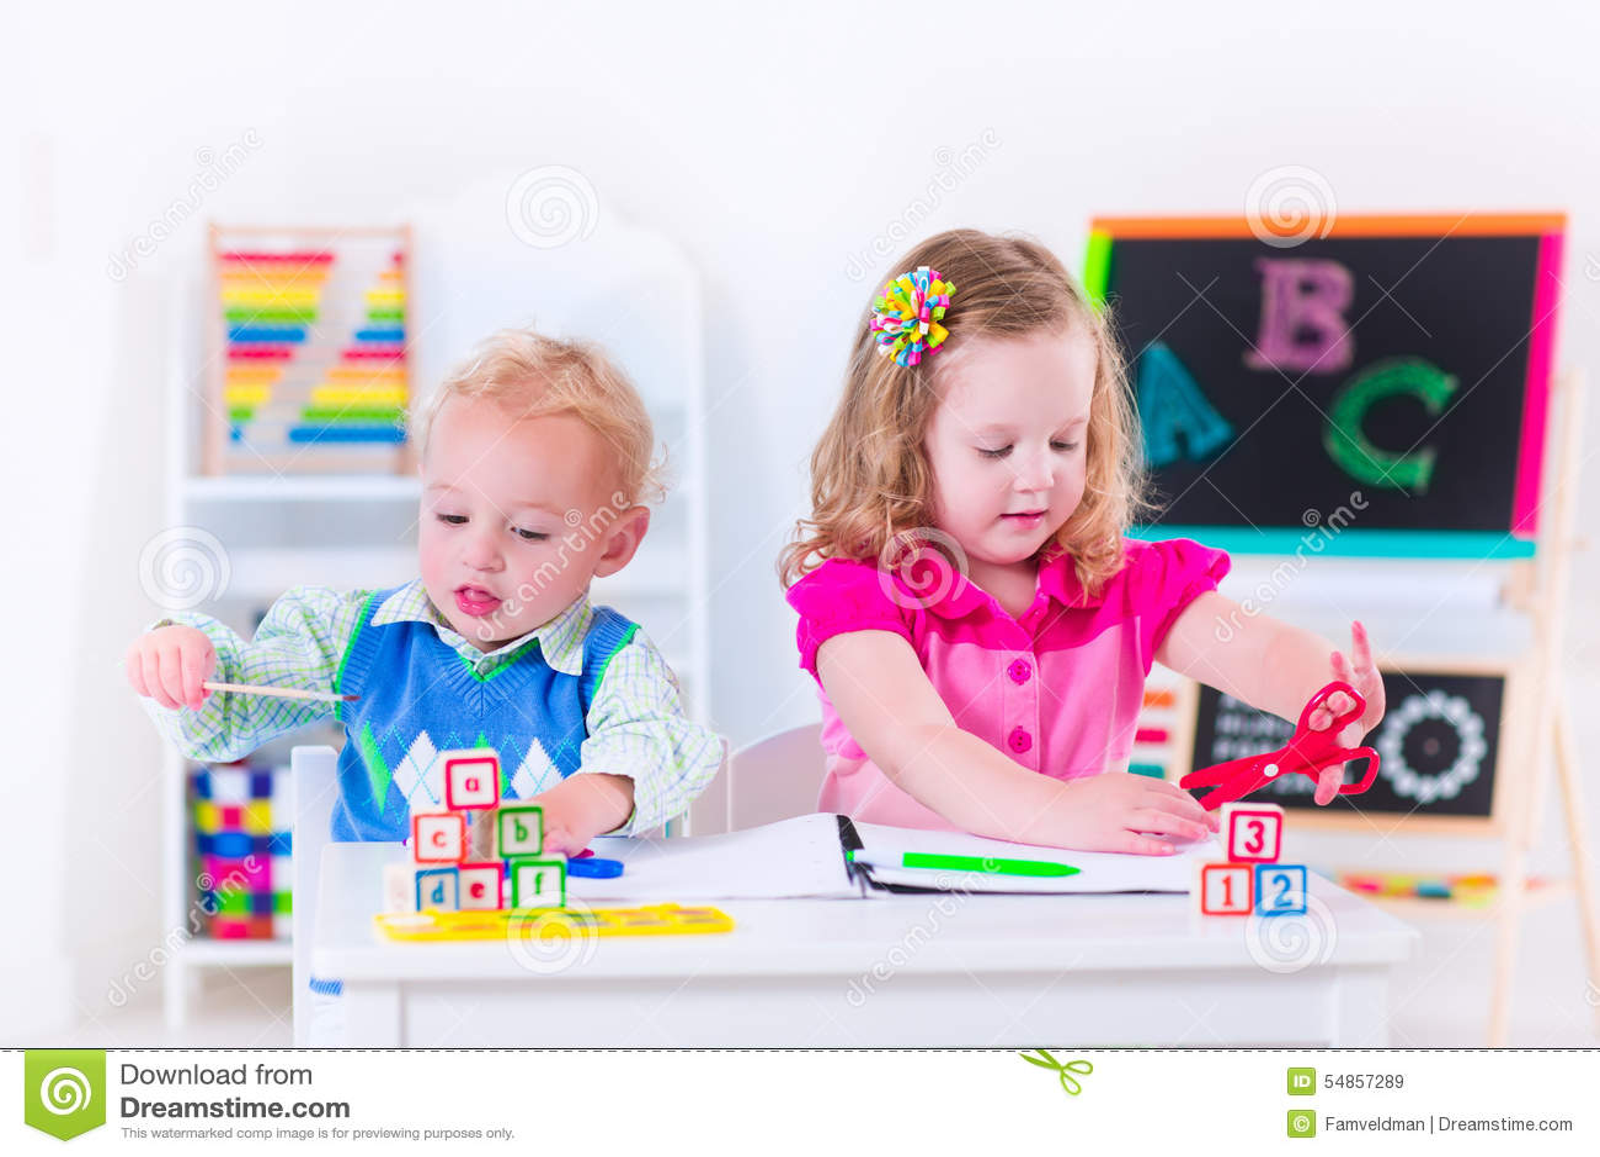 when do children go to preschool adorable at preschool painting stock photo image 959